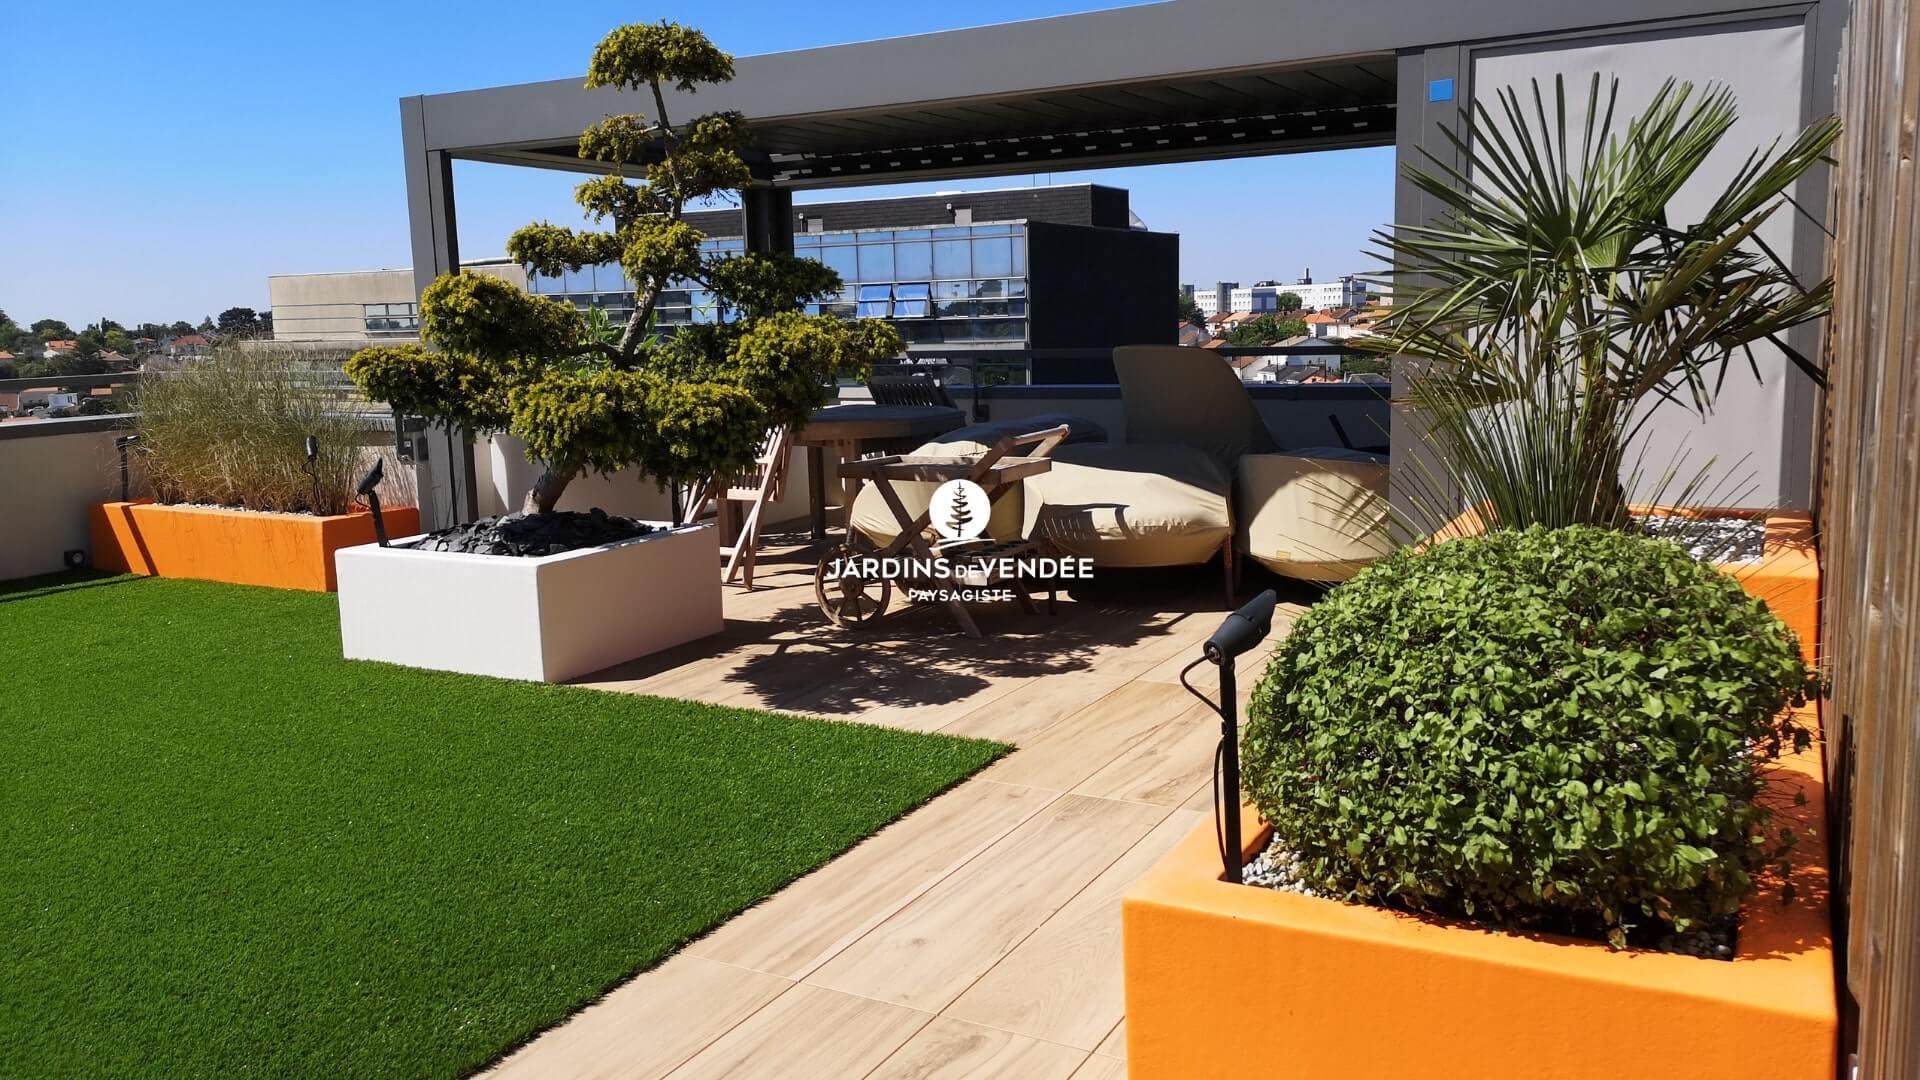 jardinsdevendee-realisations-amenagement-balcon(6)